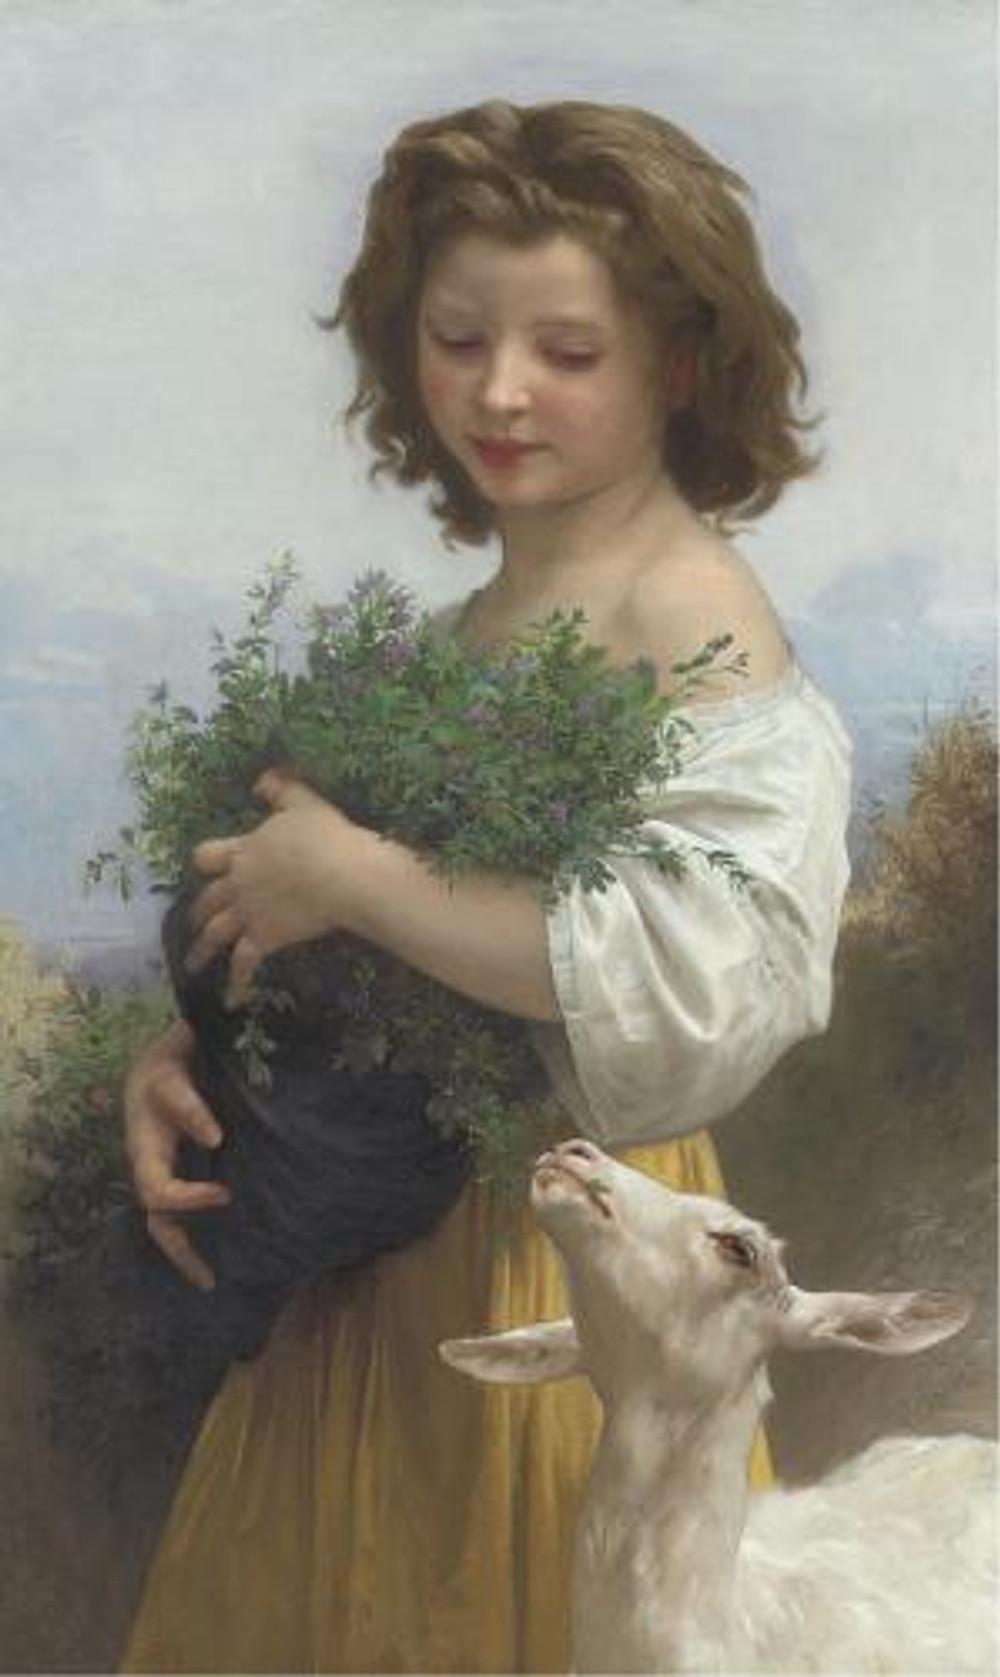 William_Adolphe_Bouguereau_-_La_Petite_Esméralda